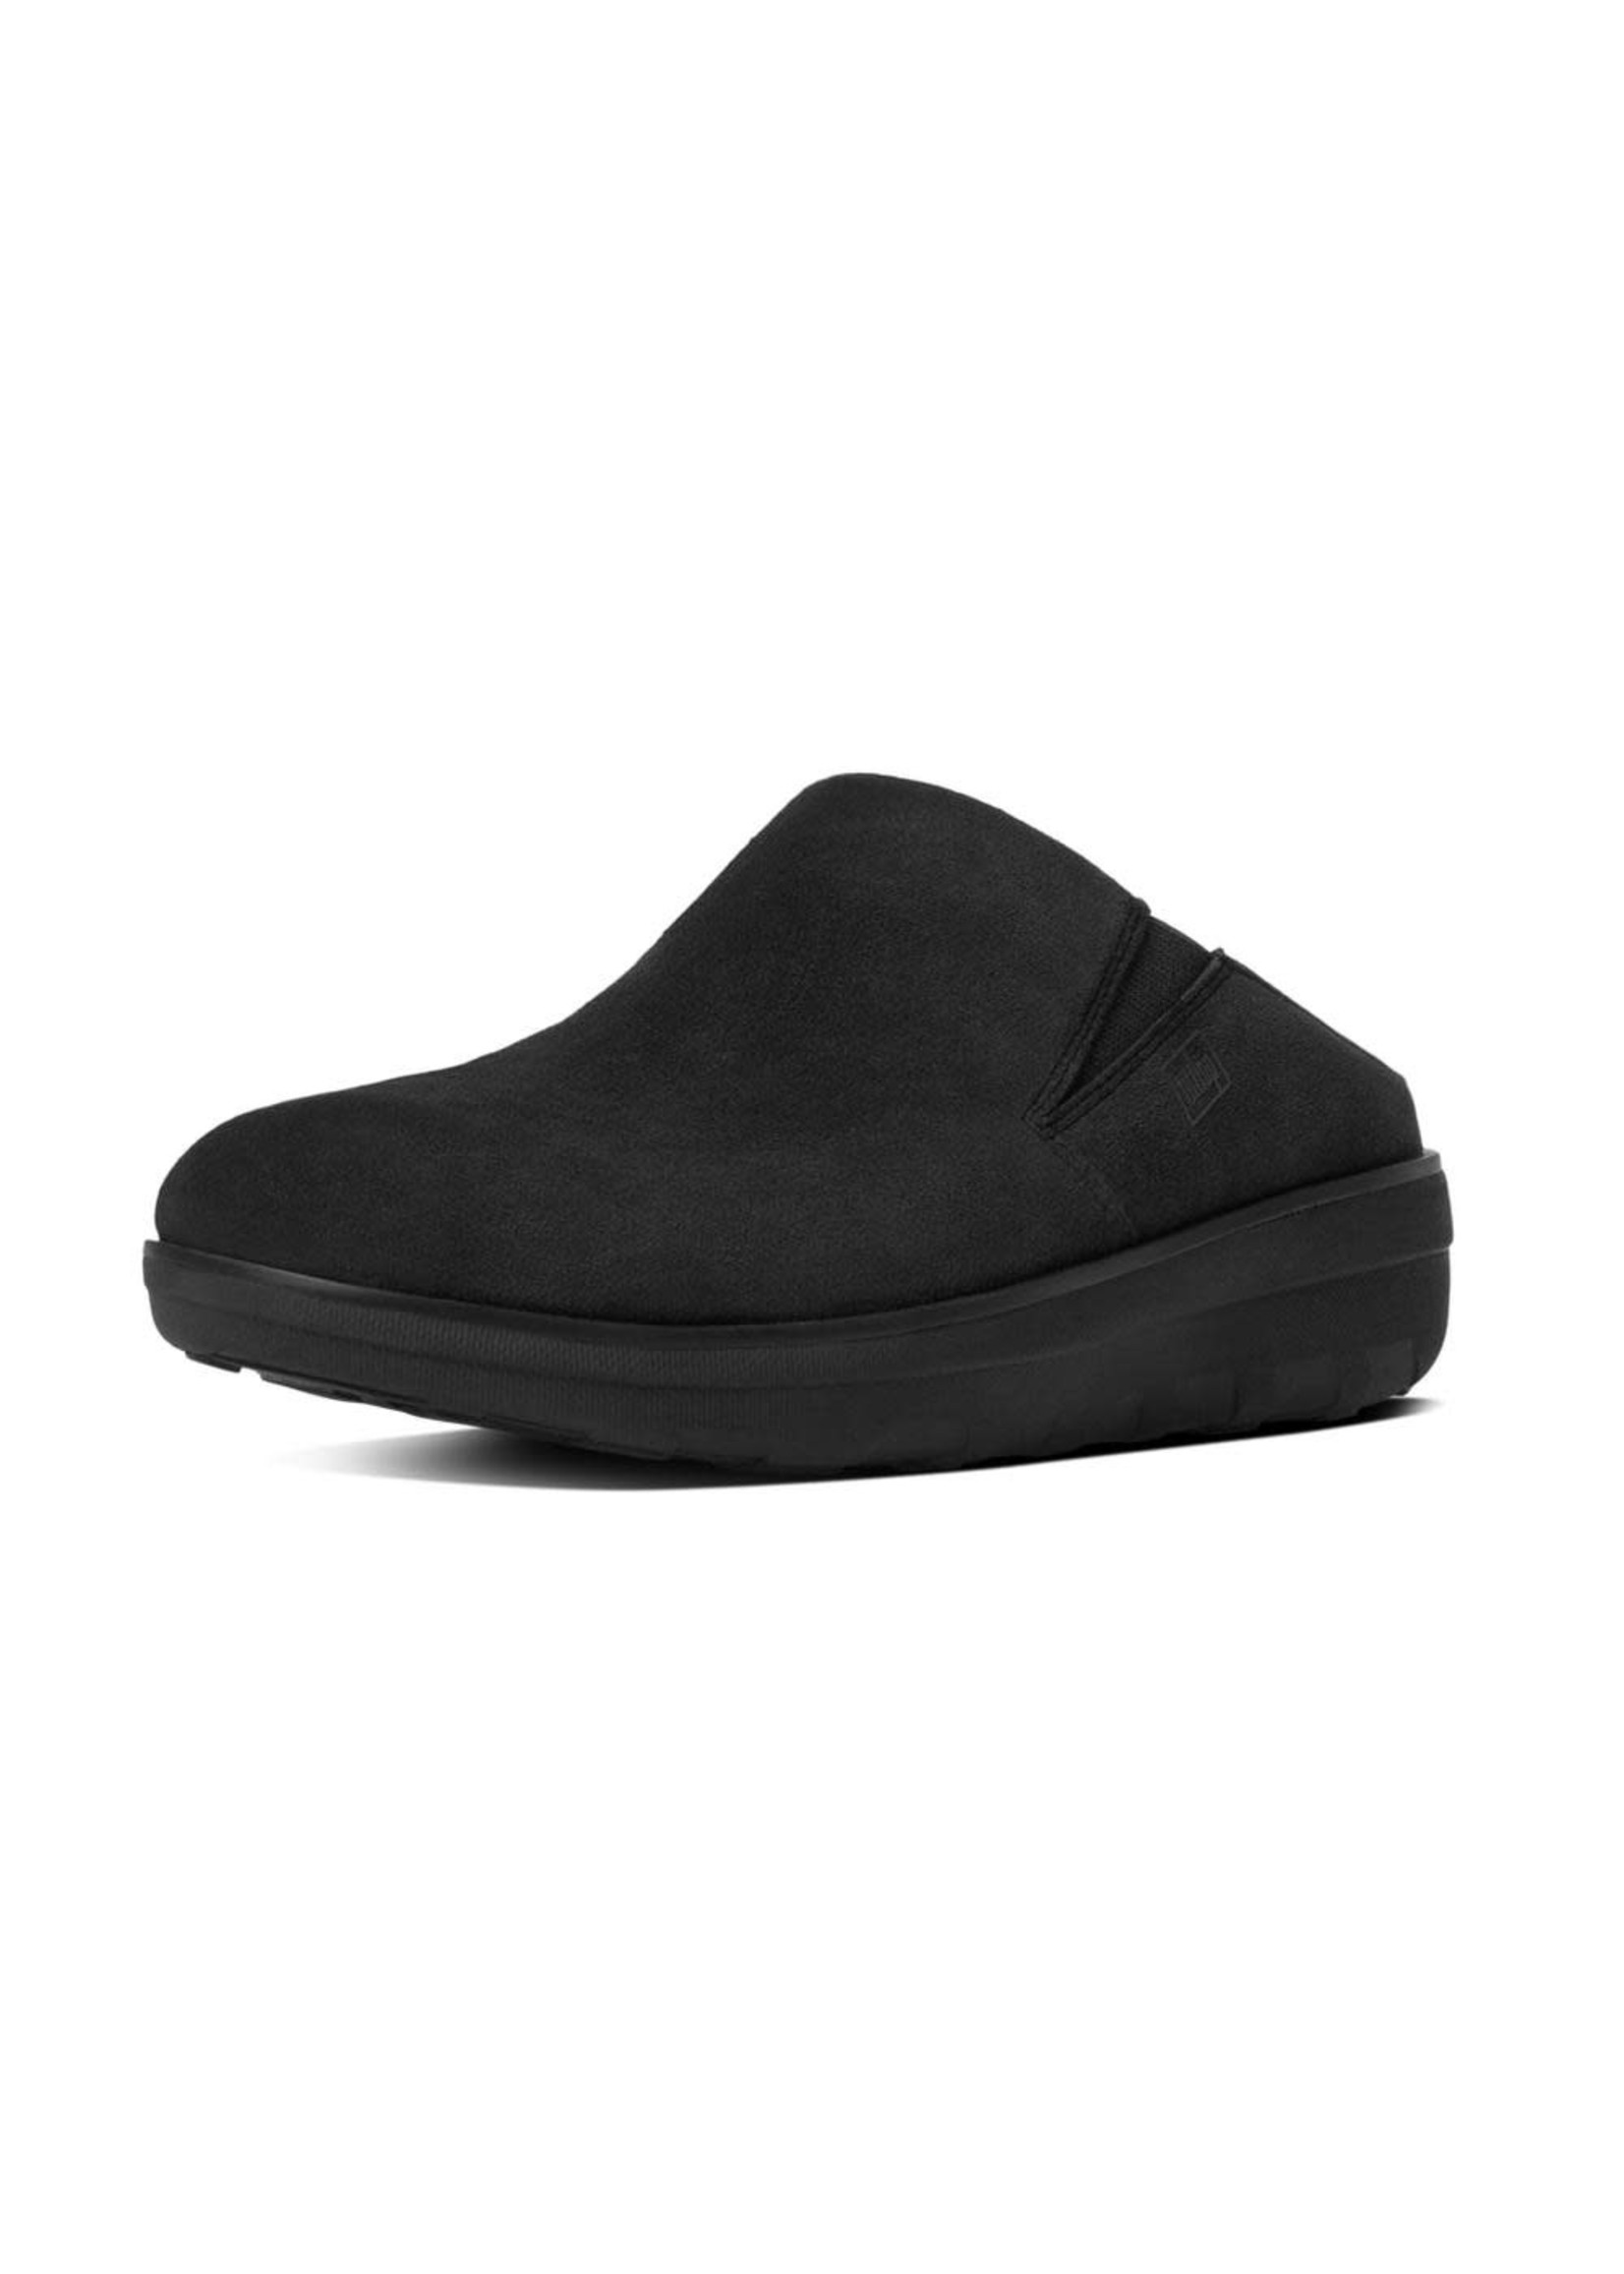 FIT FLOP FIT FLOP- LOAFF SUEDE CLOGS- BLACK